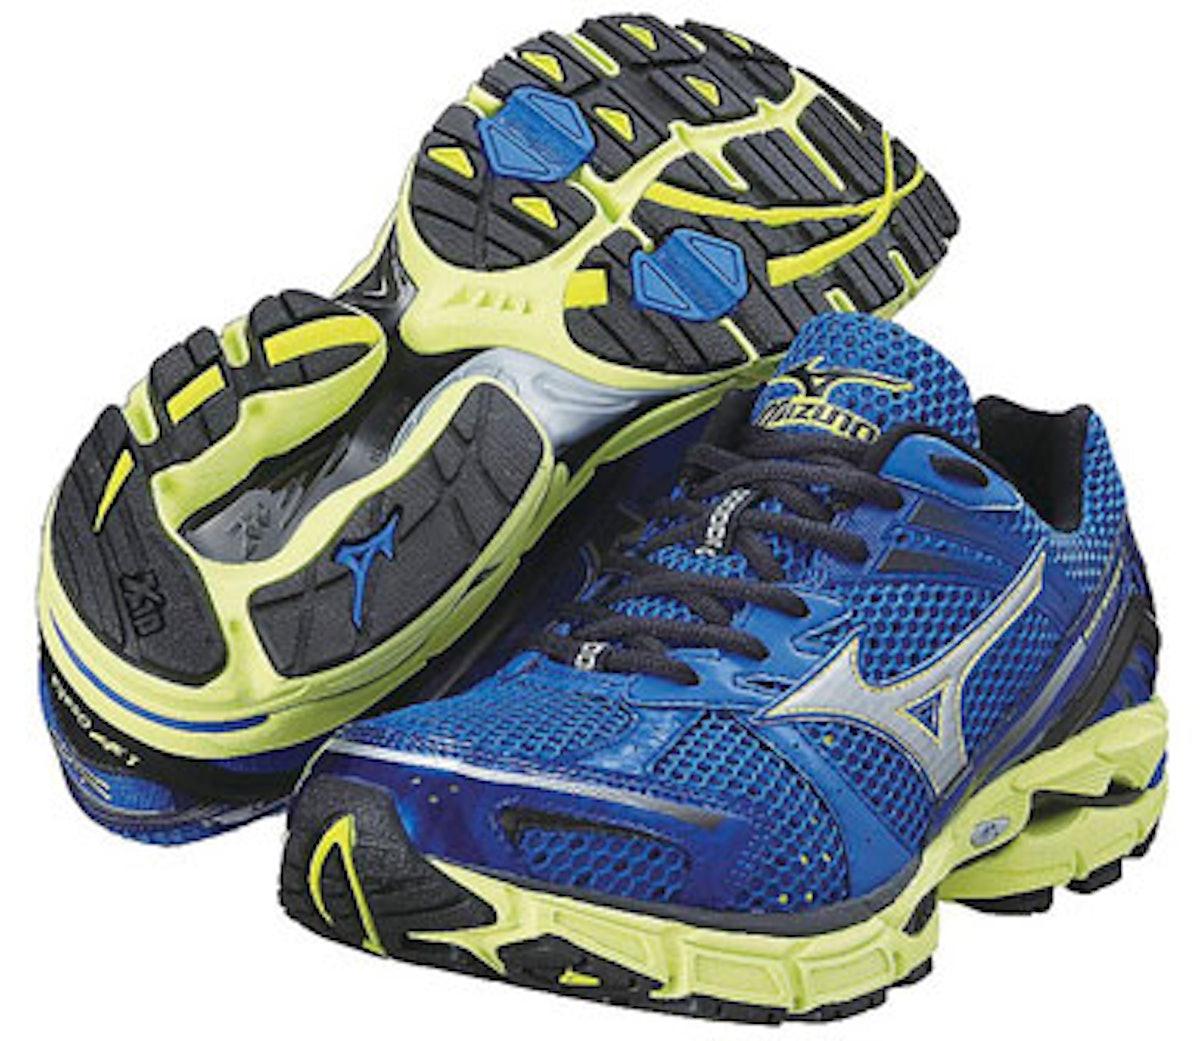 blog-fitness-mizuno-wave-inspire-8-osaka-marathon-limited-edition.jpg